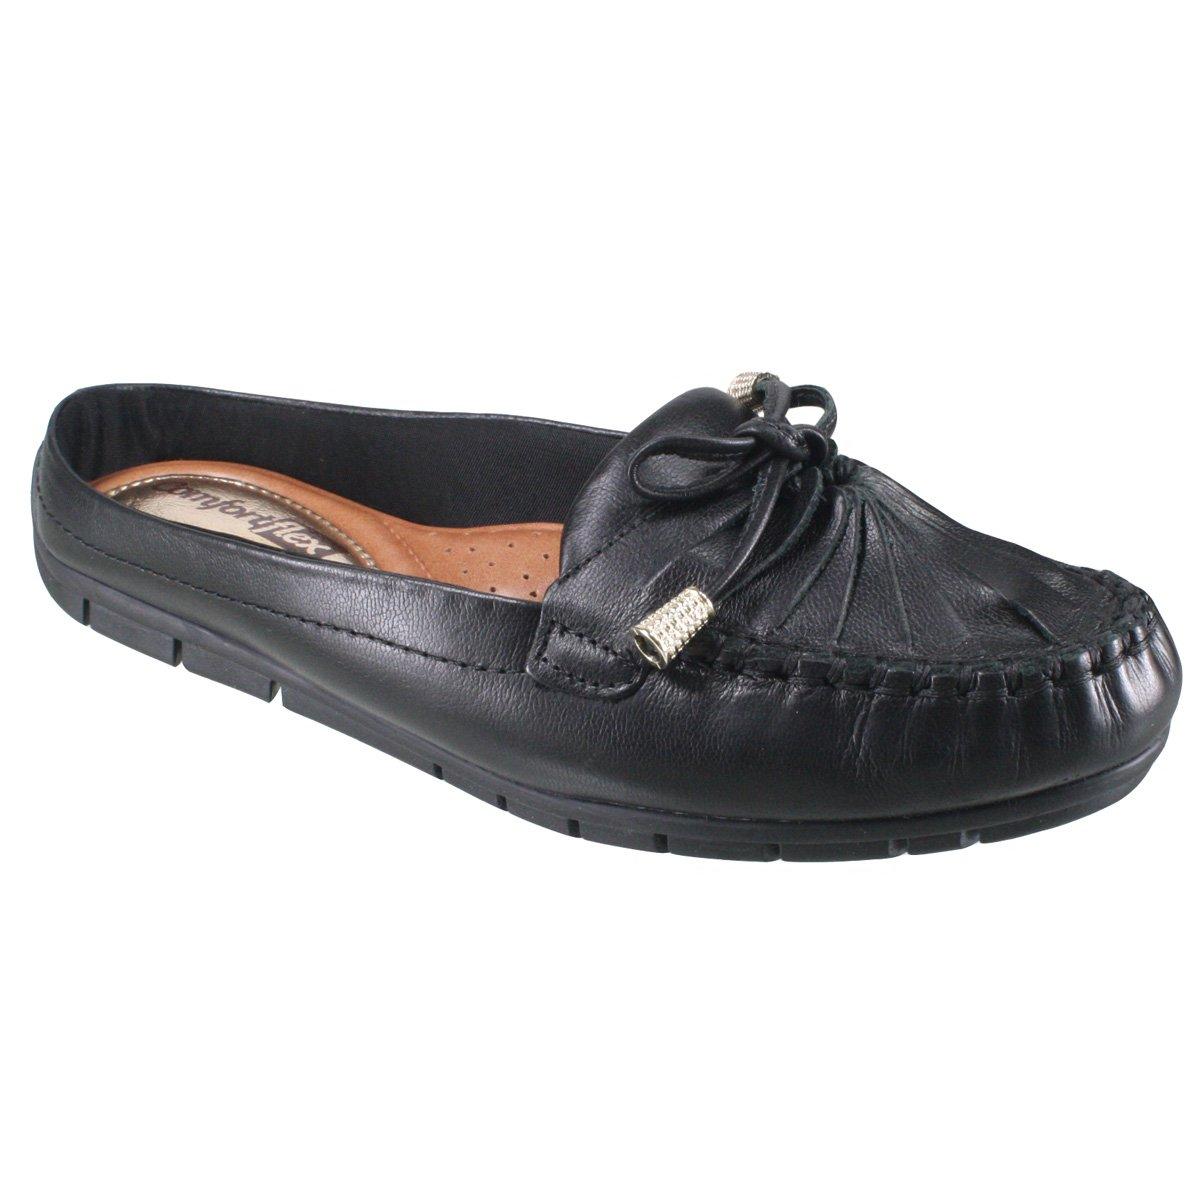 a616442f2 Sapato Mule Comfortflex 17-73402 000008 - Preto (Print Vest) - Botas ...